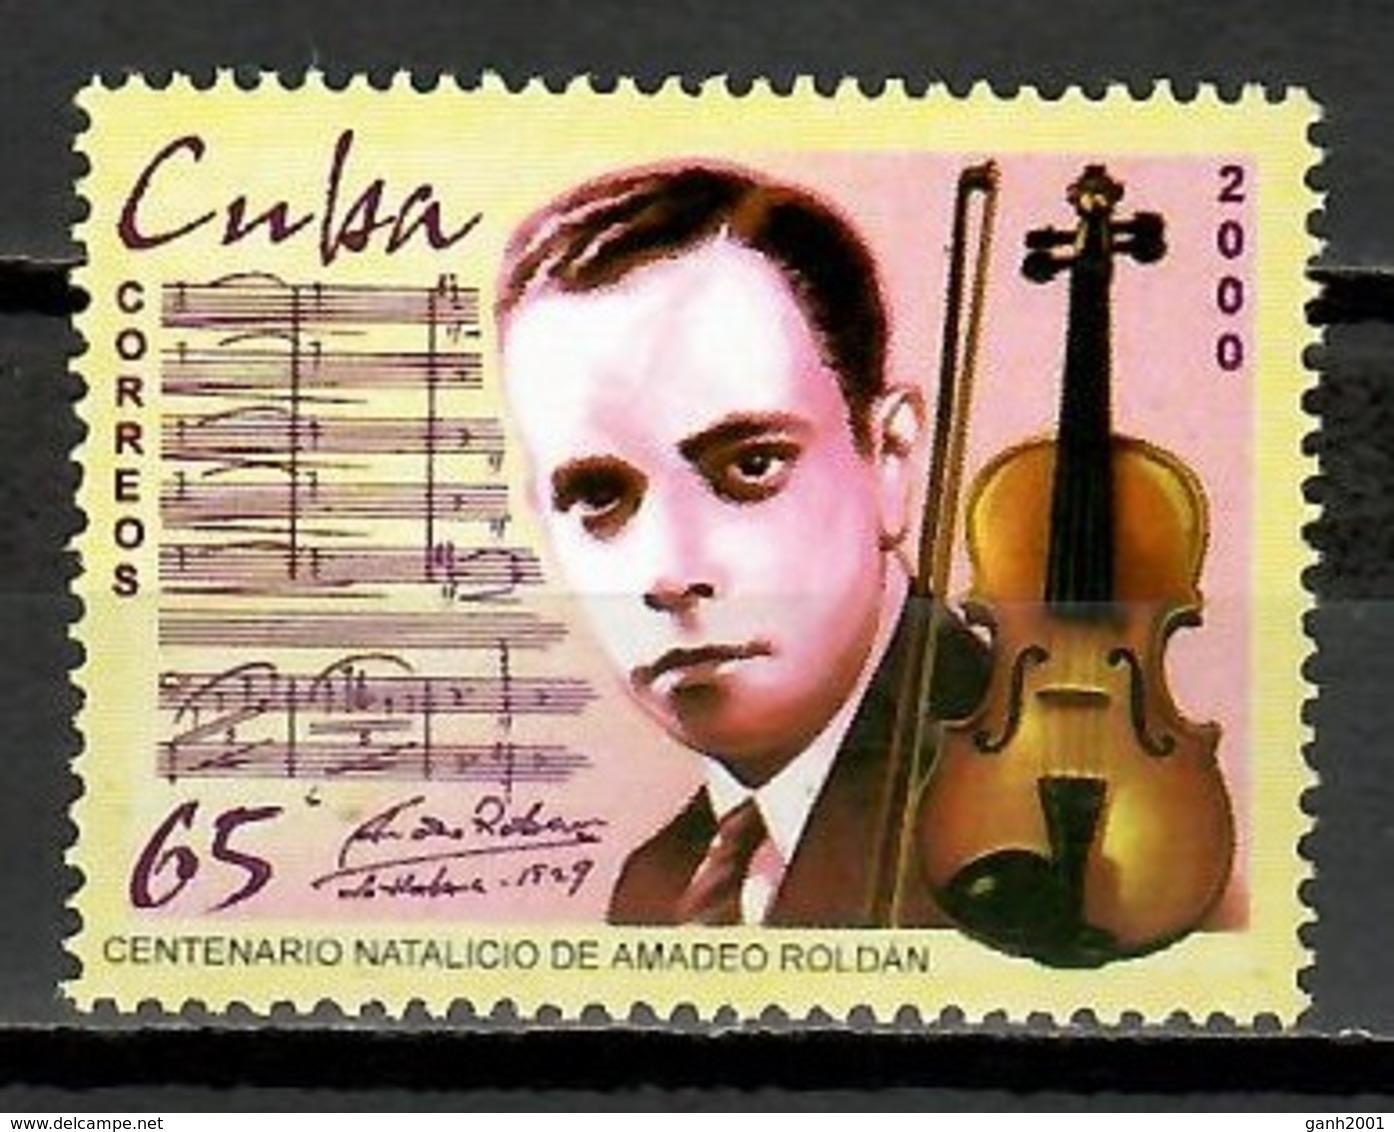 Cuba 2000 / Musician Amadeo Roldán Music MNH Música Musik / Cu11407  C5-25 - Música